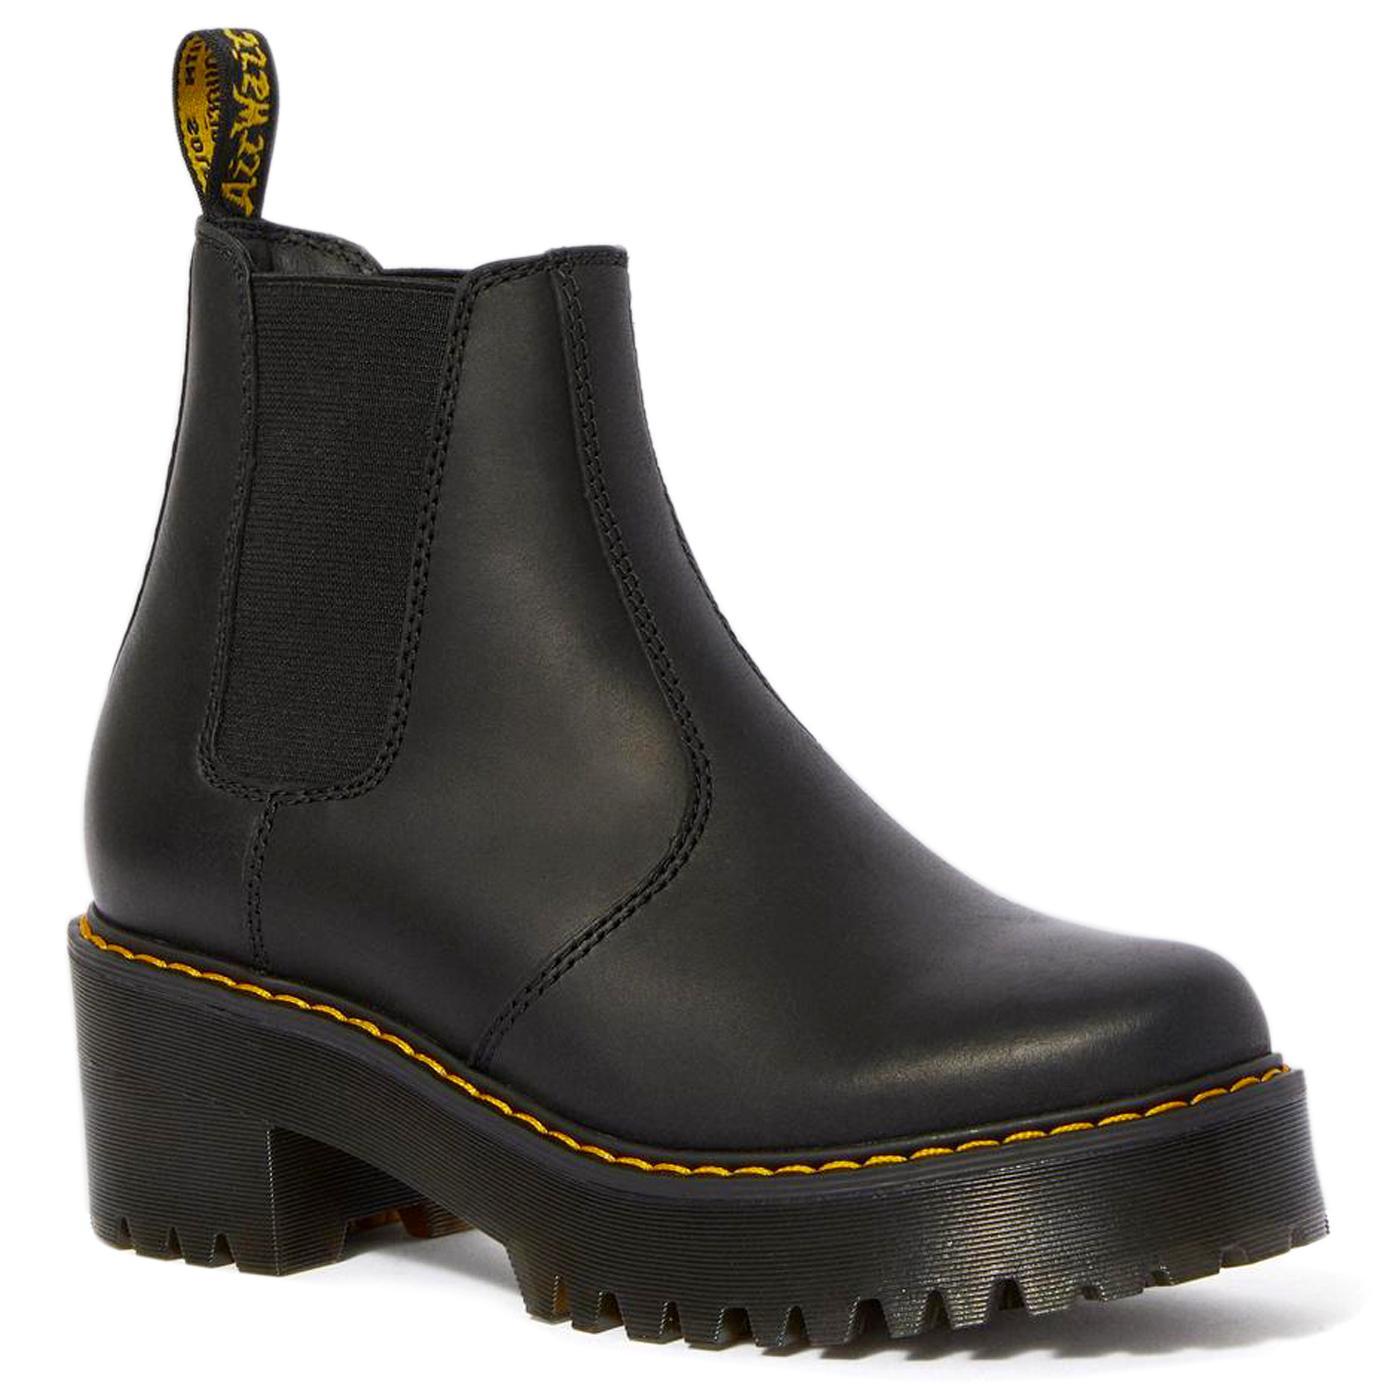 Rometty DR MARTENS Retro Platform Chelsea Boots